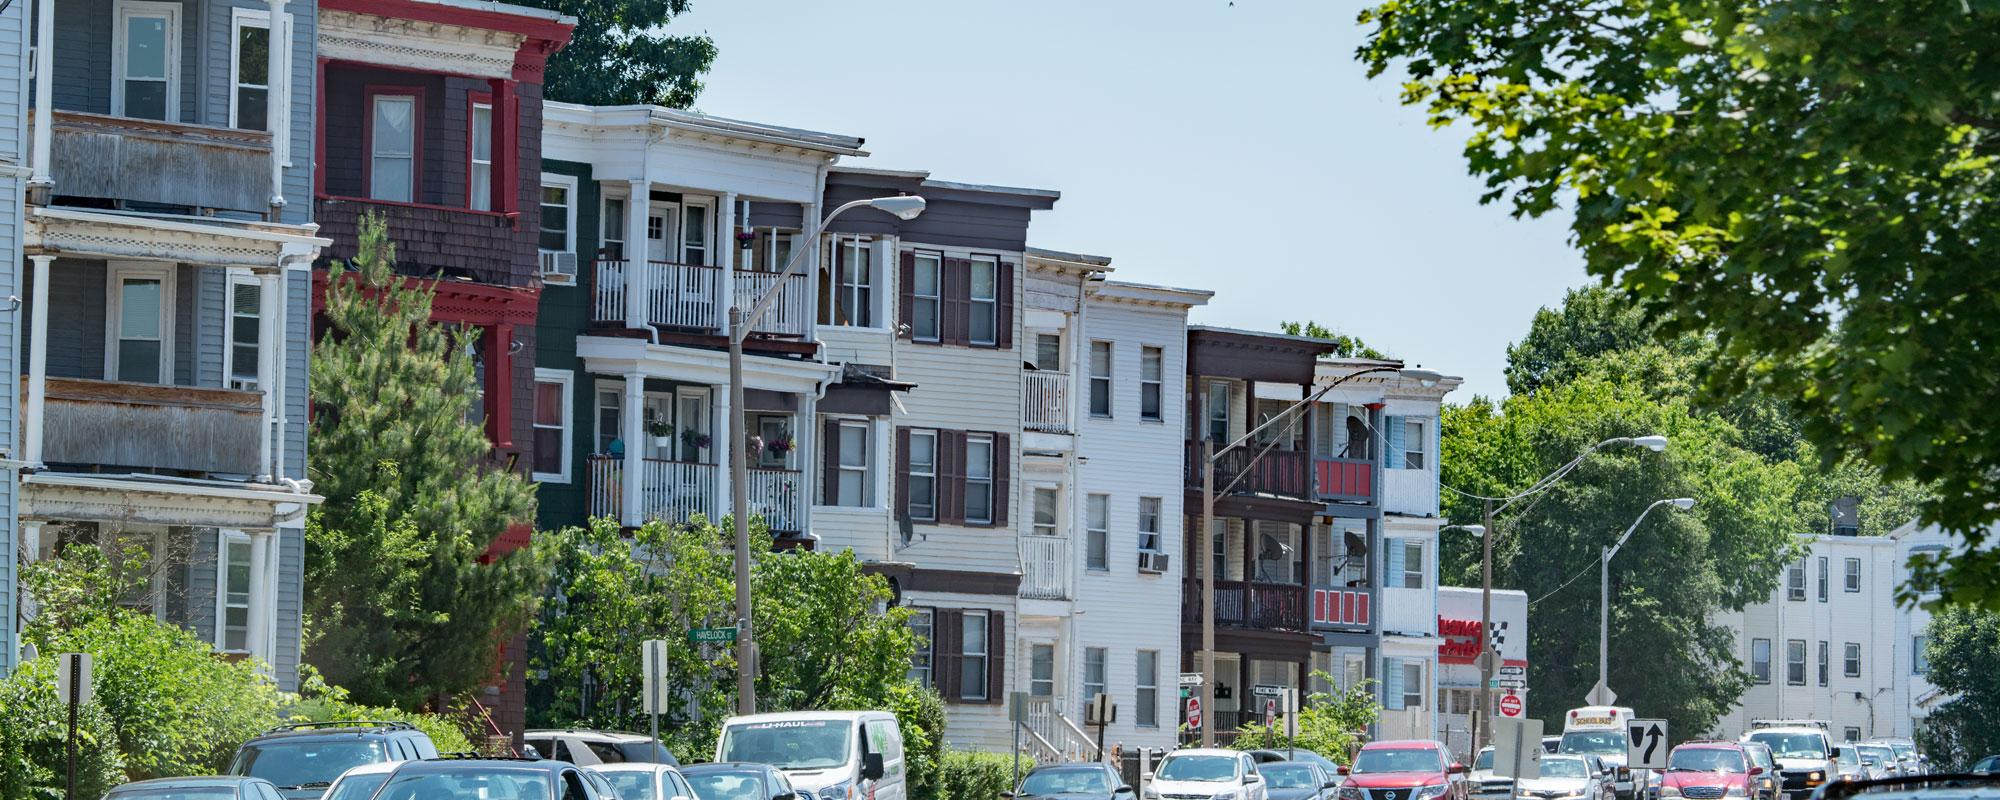 Affordable Housing In Boston Boston Gov